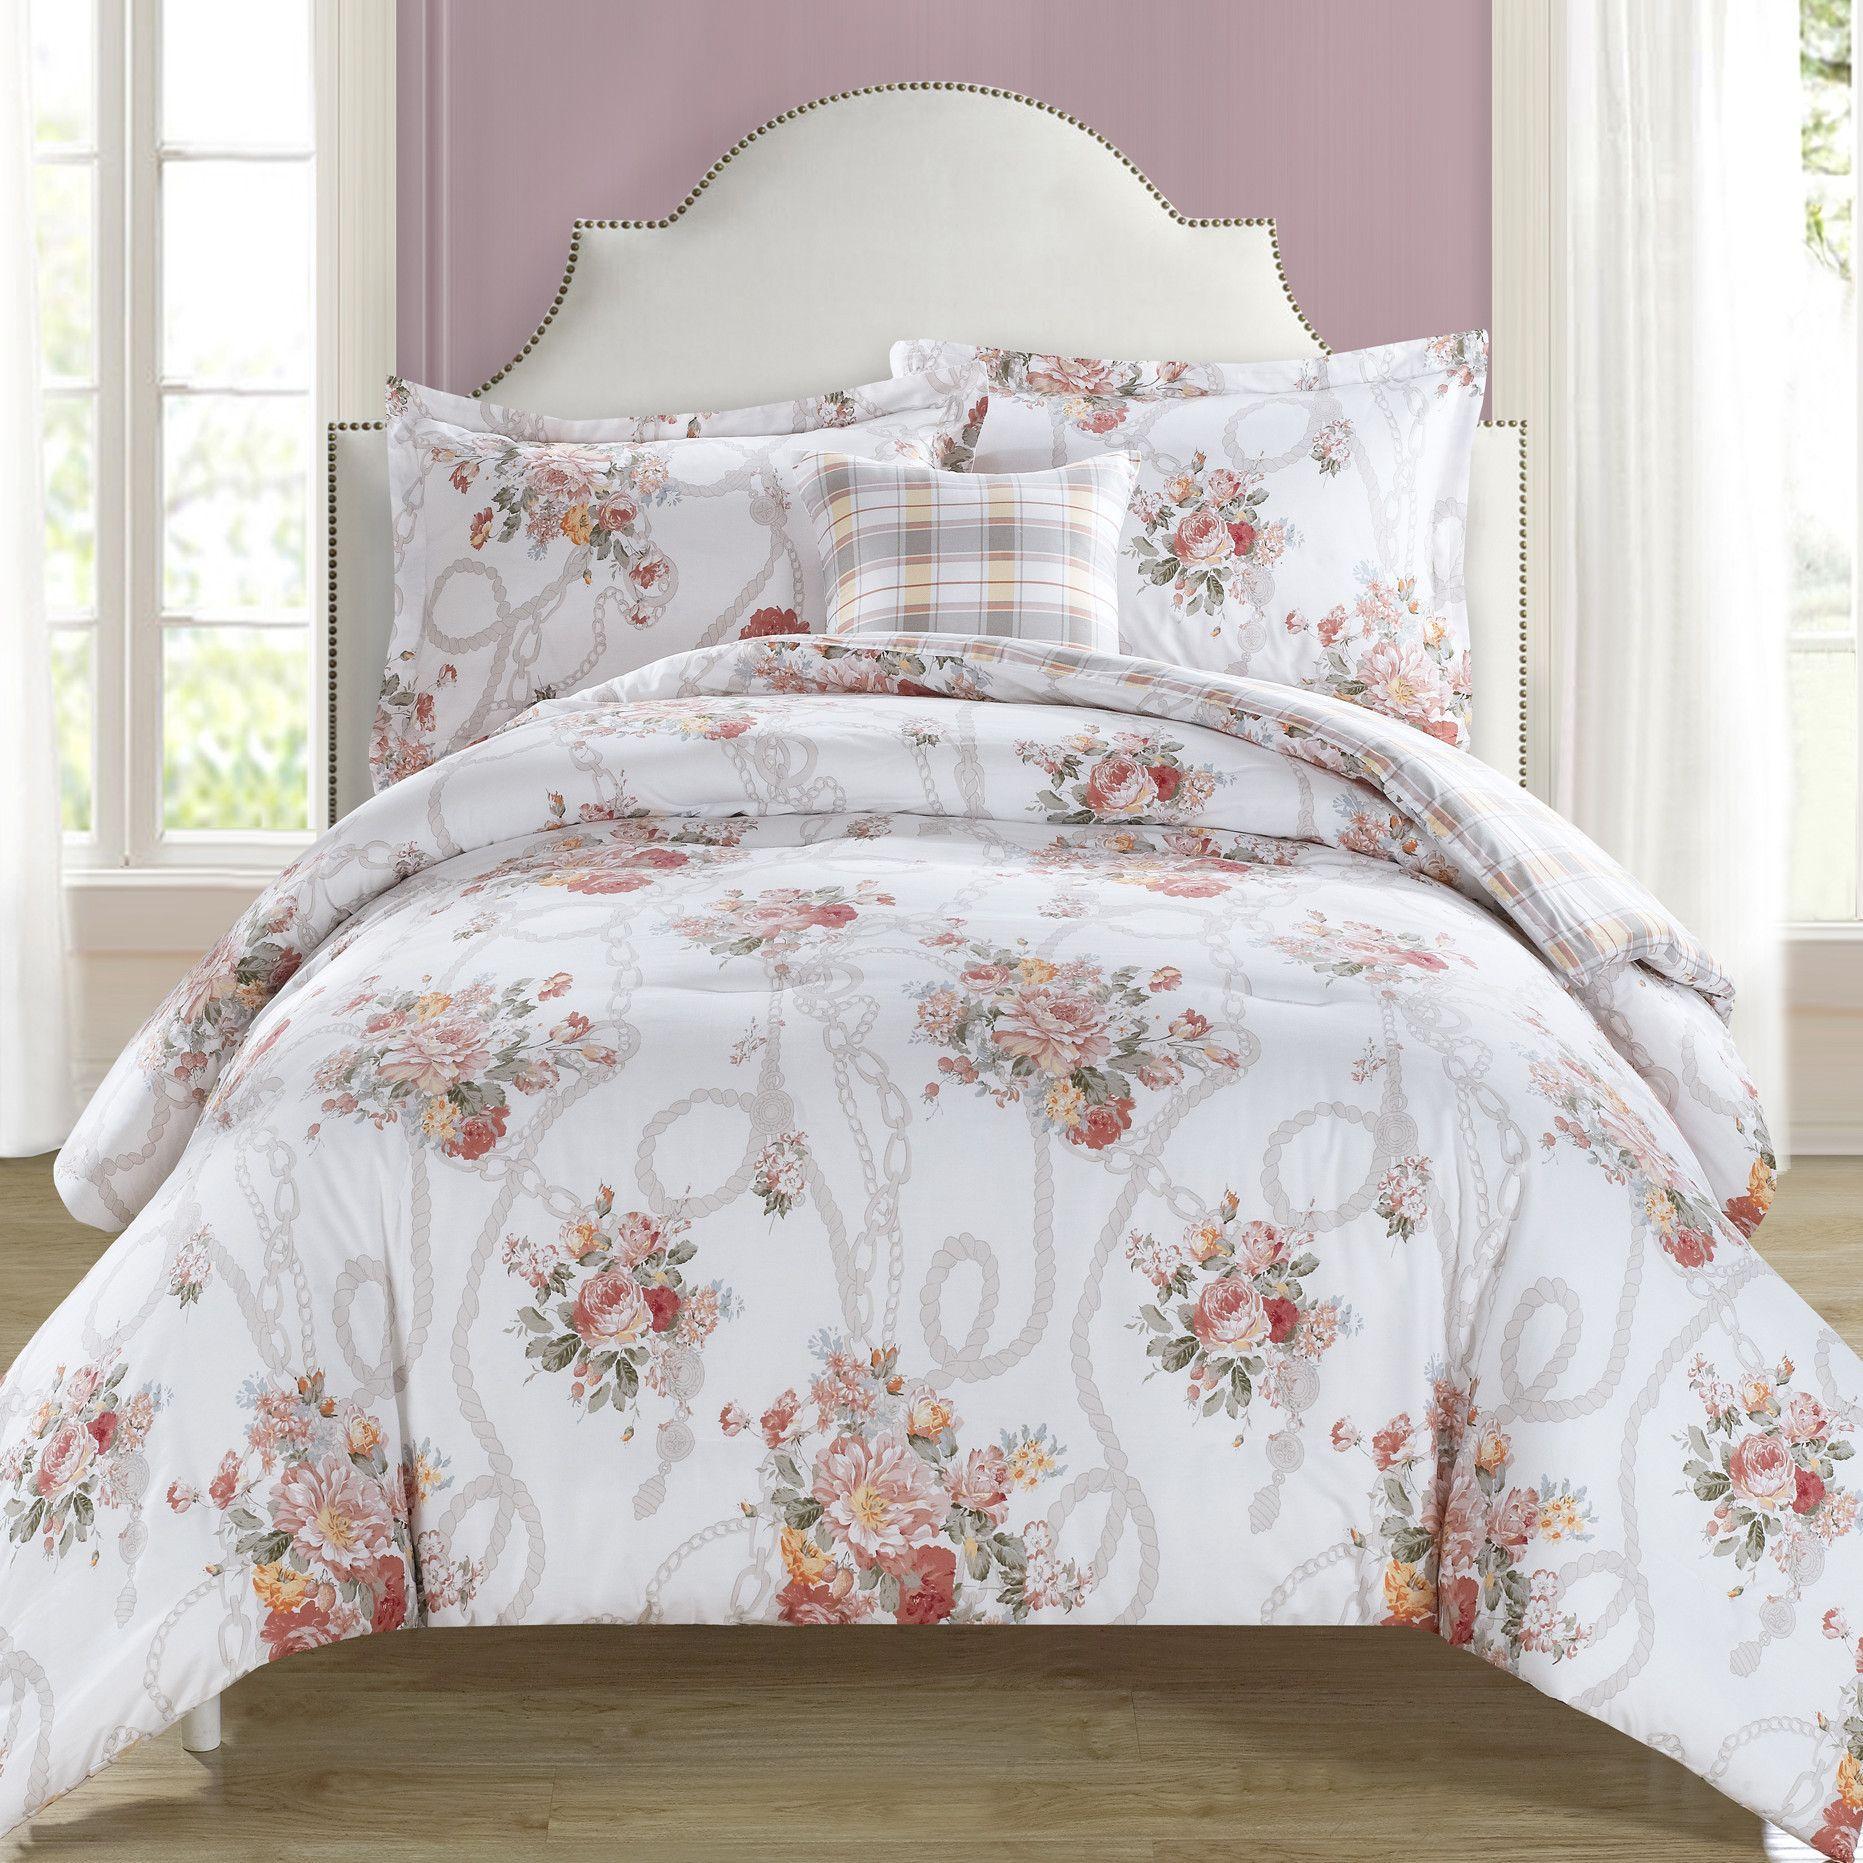 Sheridan 4 Piece Reversible Comforter Set - Products - Pinterest